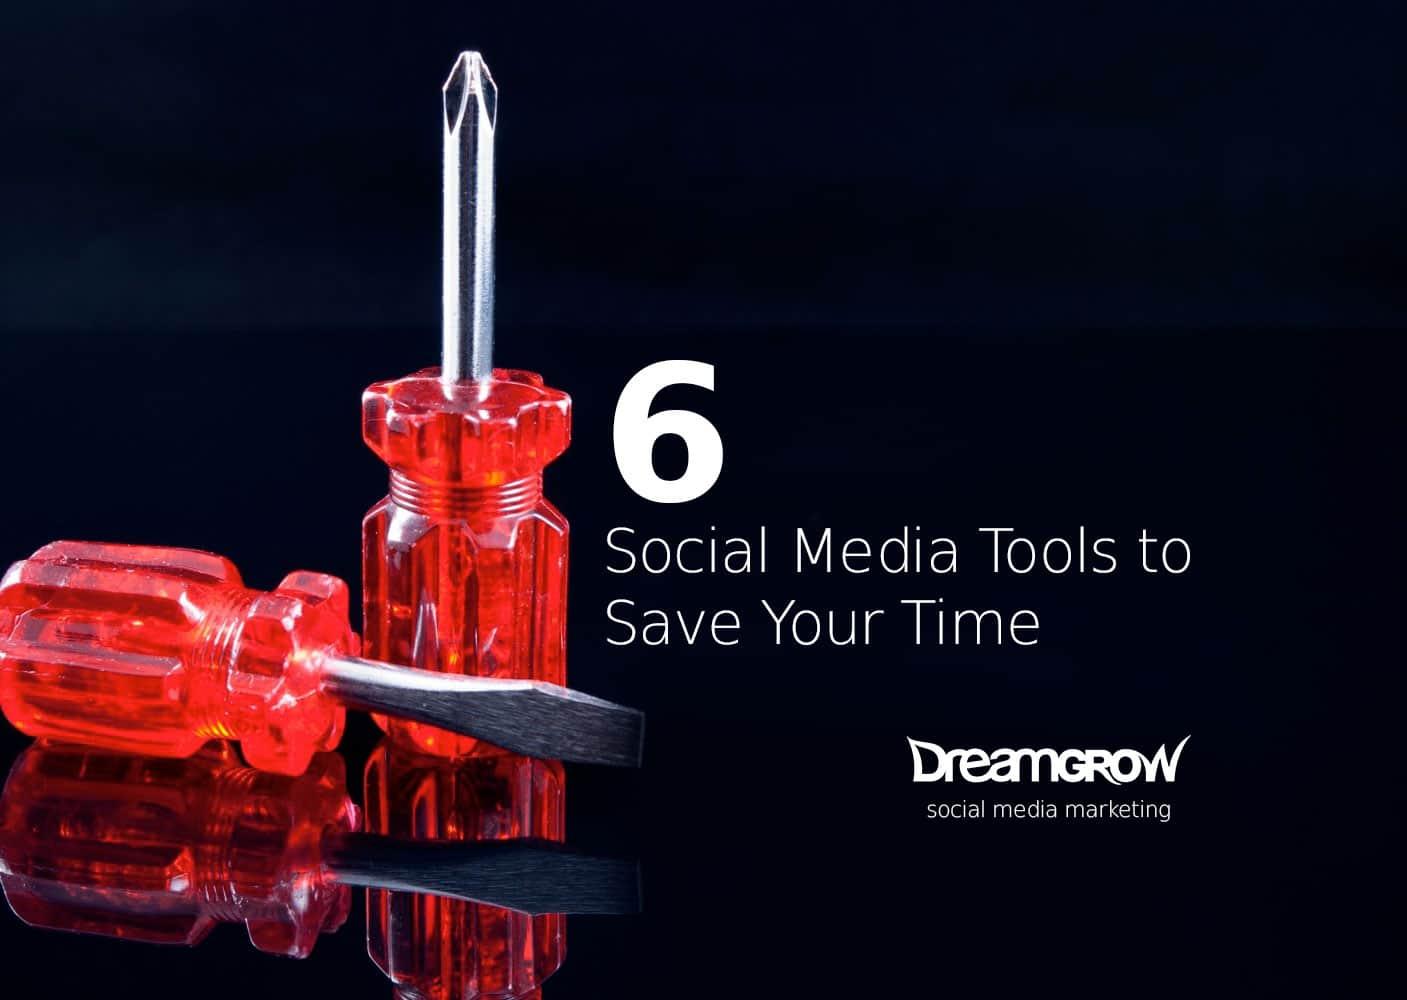 time saving social media tools